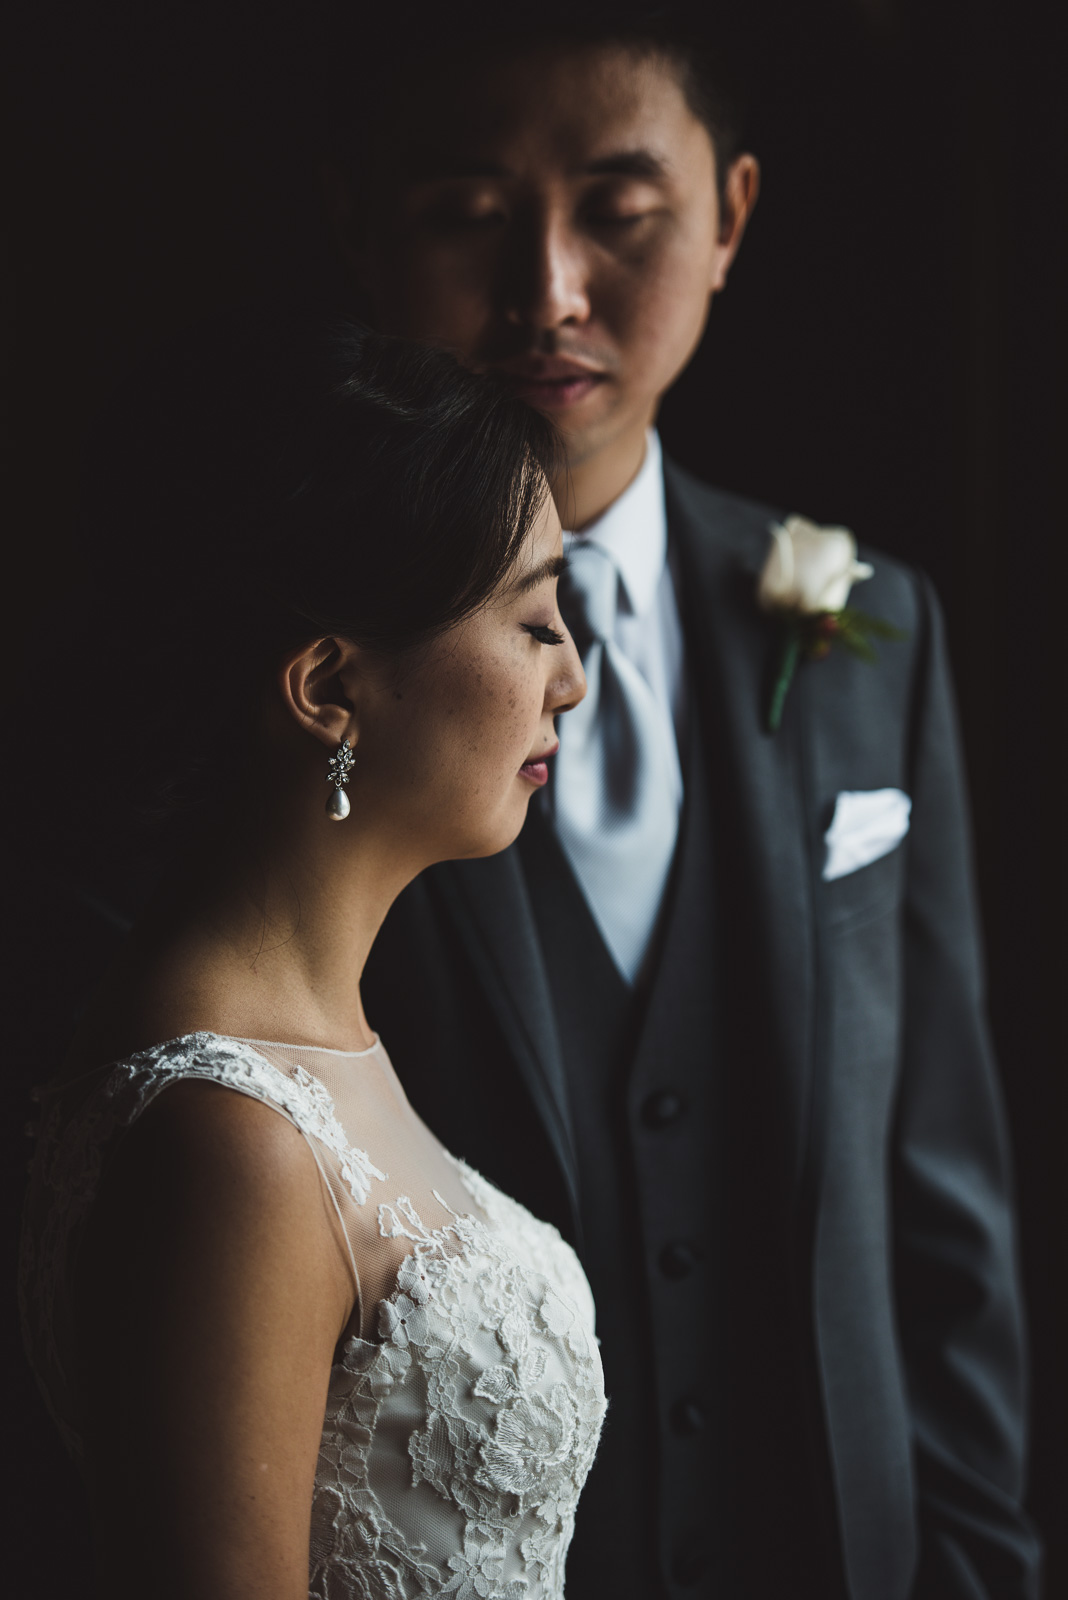 victoria-wedding-photographers-cecil-green-park-house-wedding-17.jpg